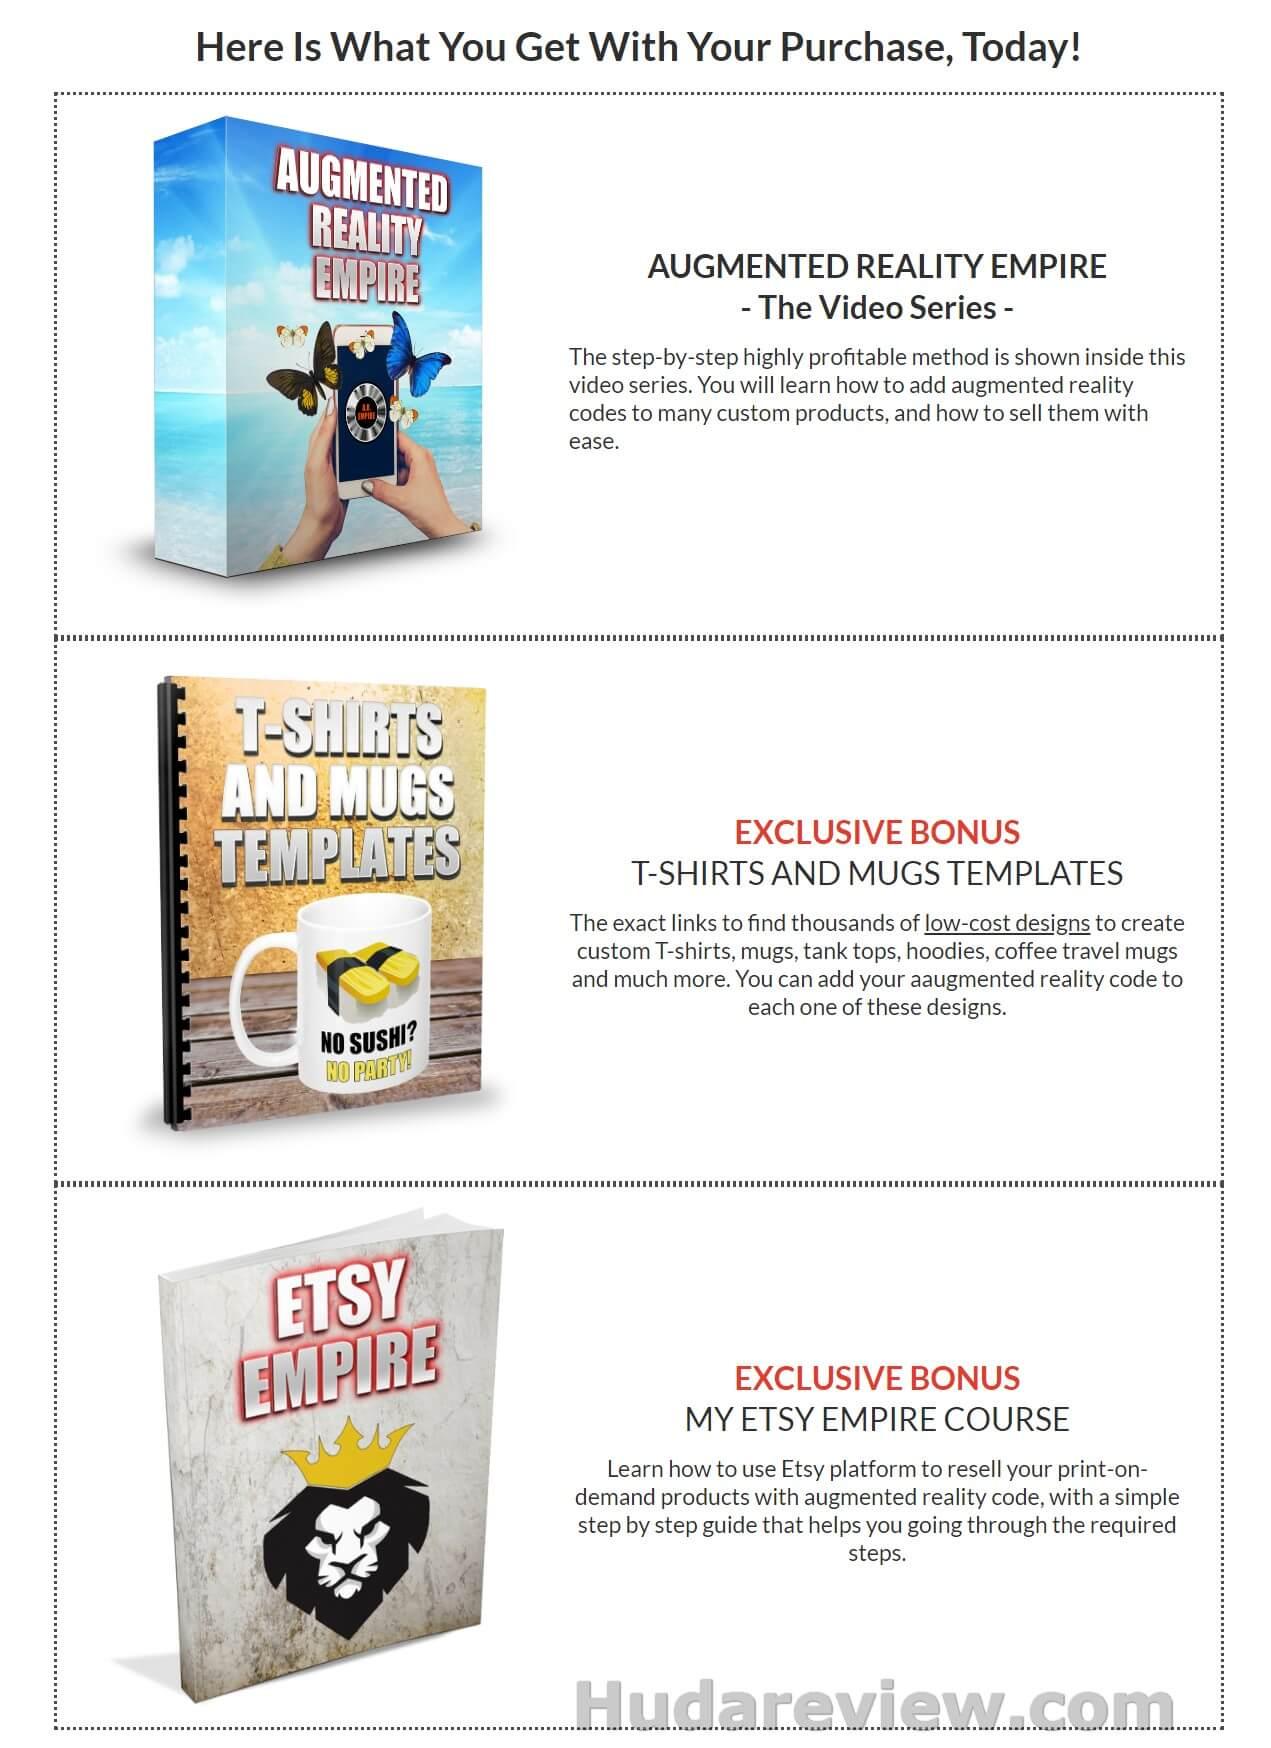 Augmented-Reality-Empire-Review-Bonuses